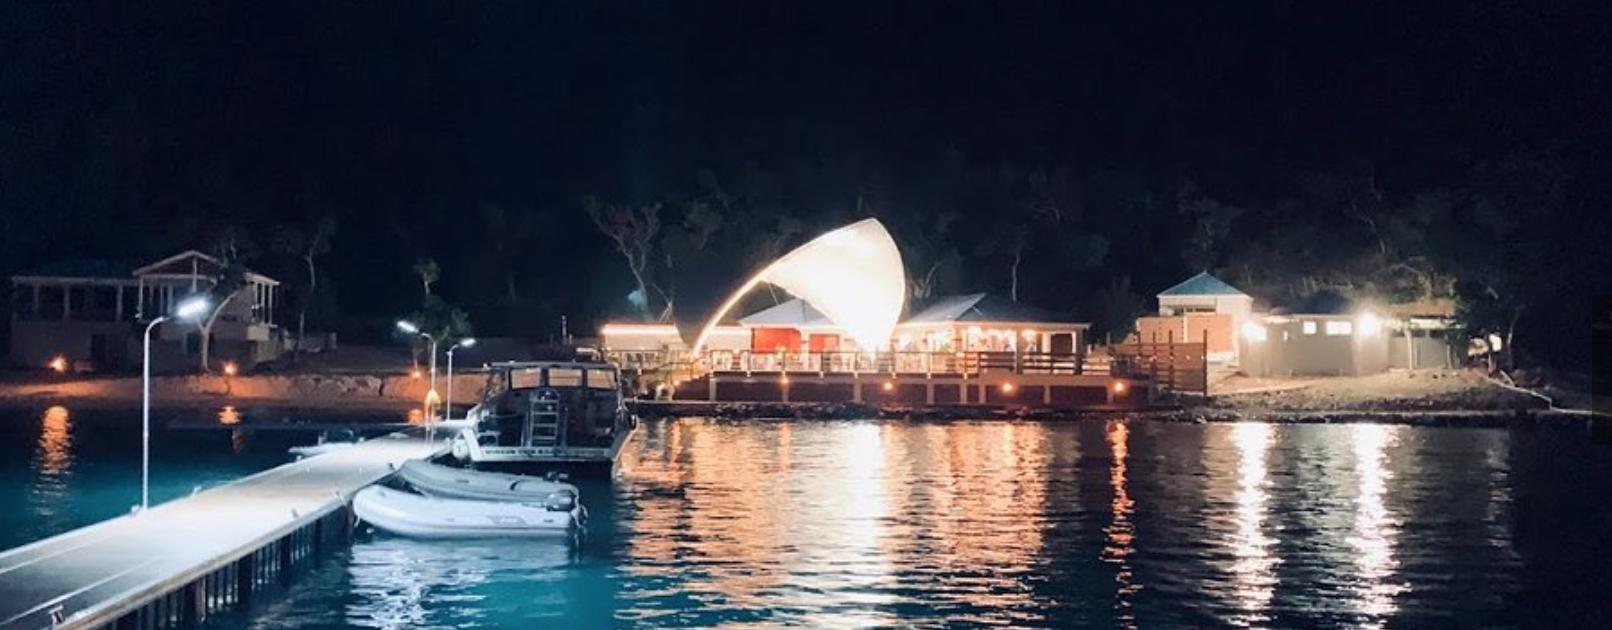 Ocean's 7 Yacht Club